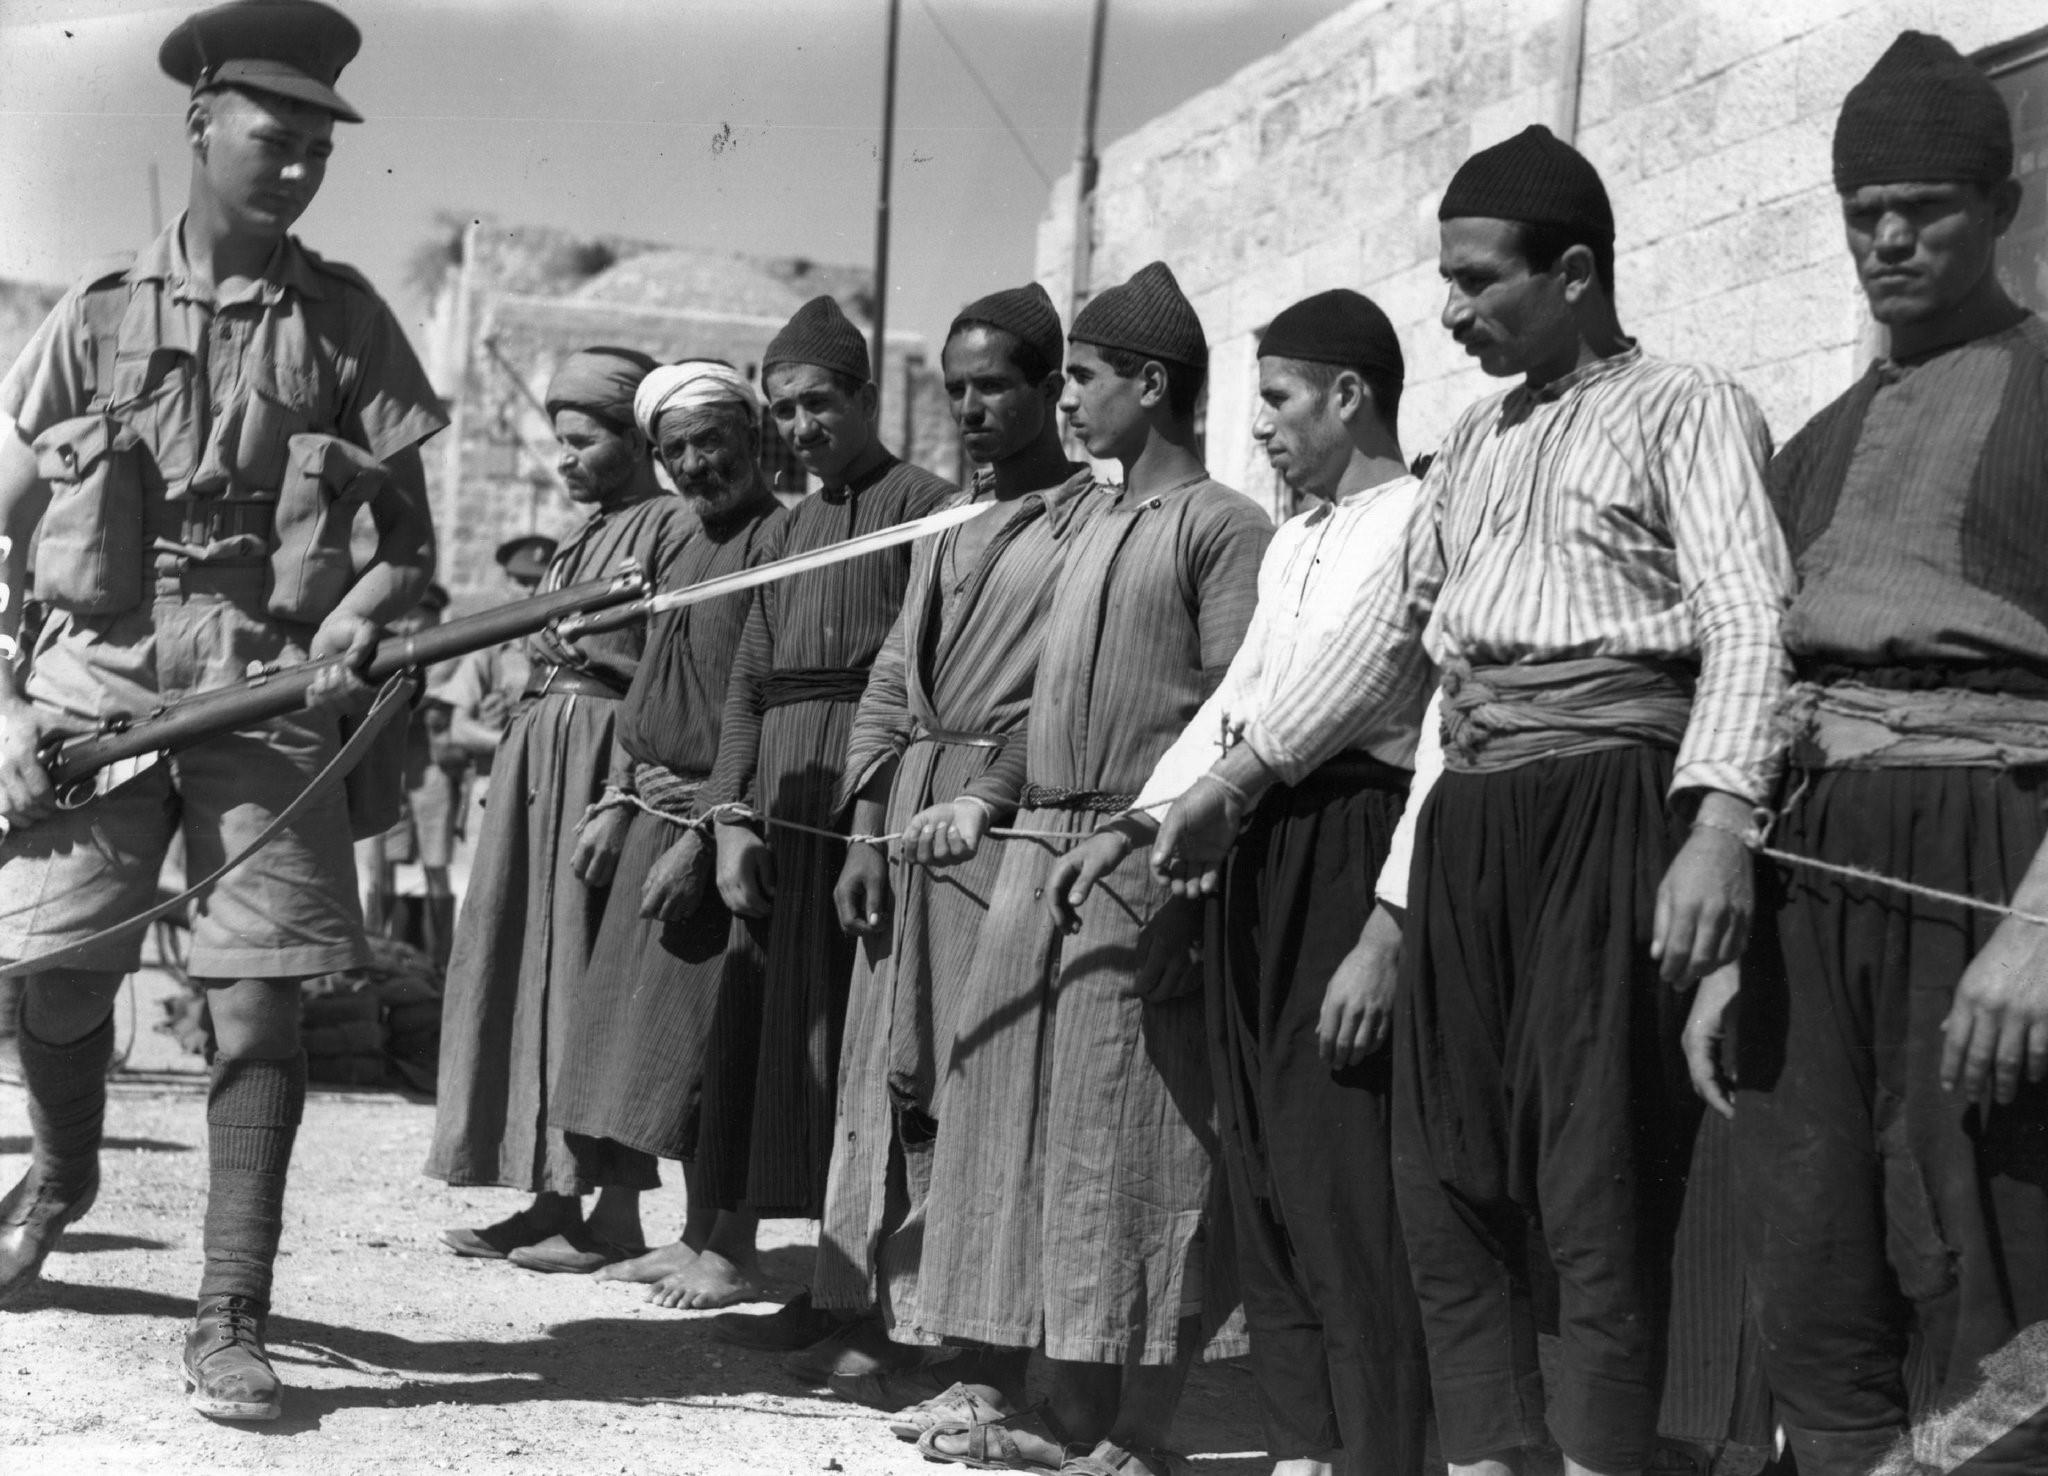 Jerusalem: Vung dat thanh nghin nam xung dot hinh anh 3